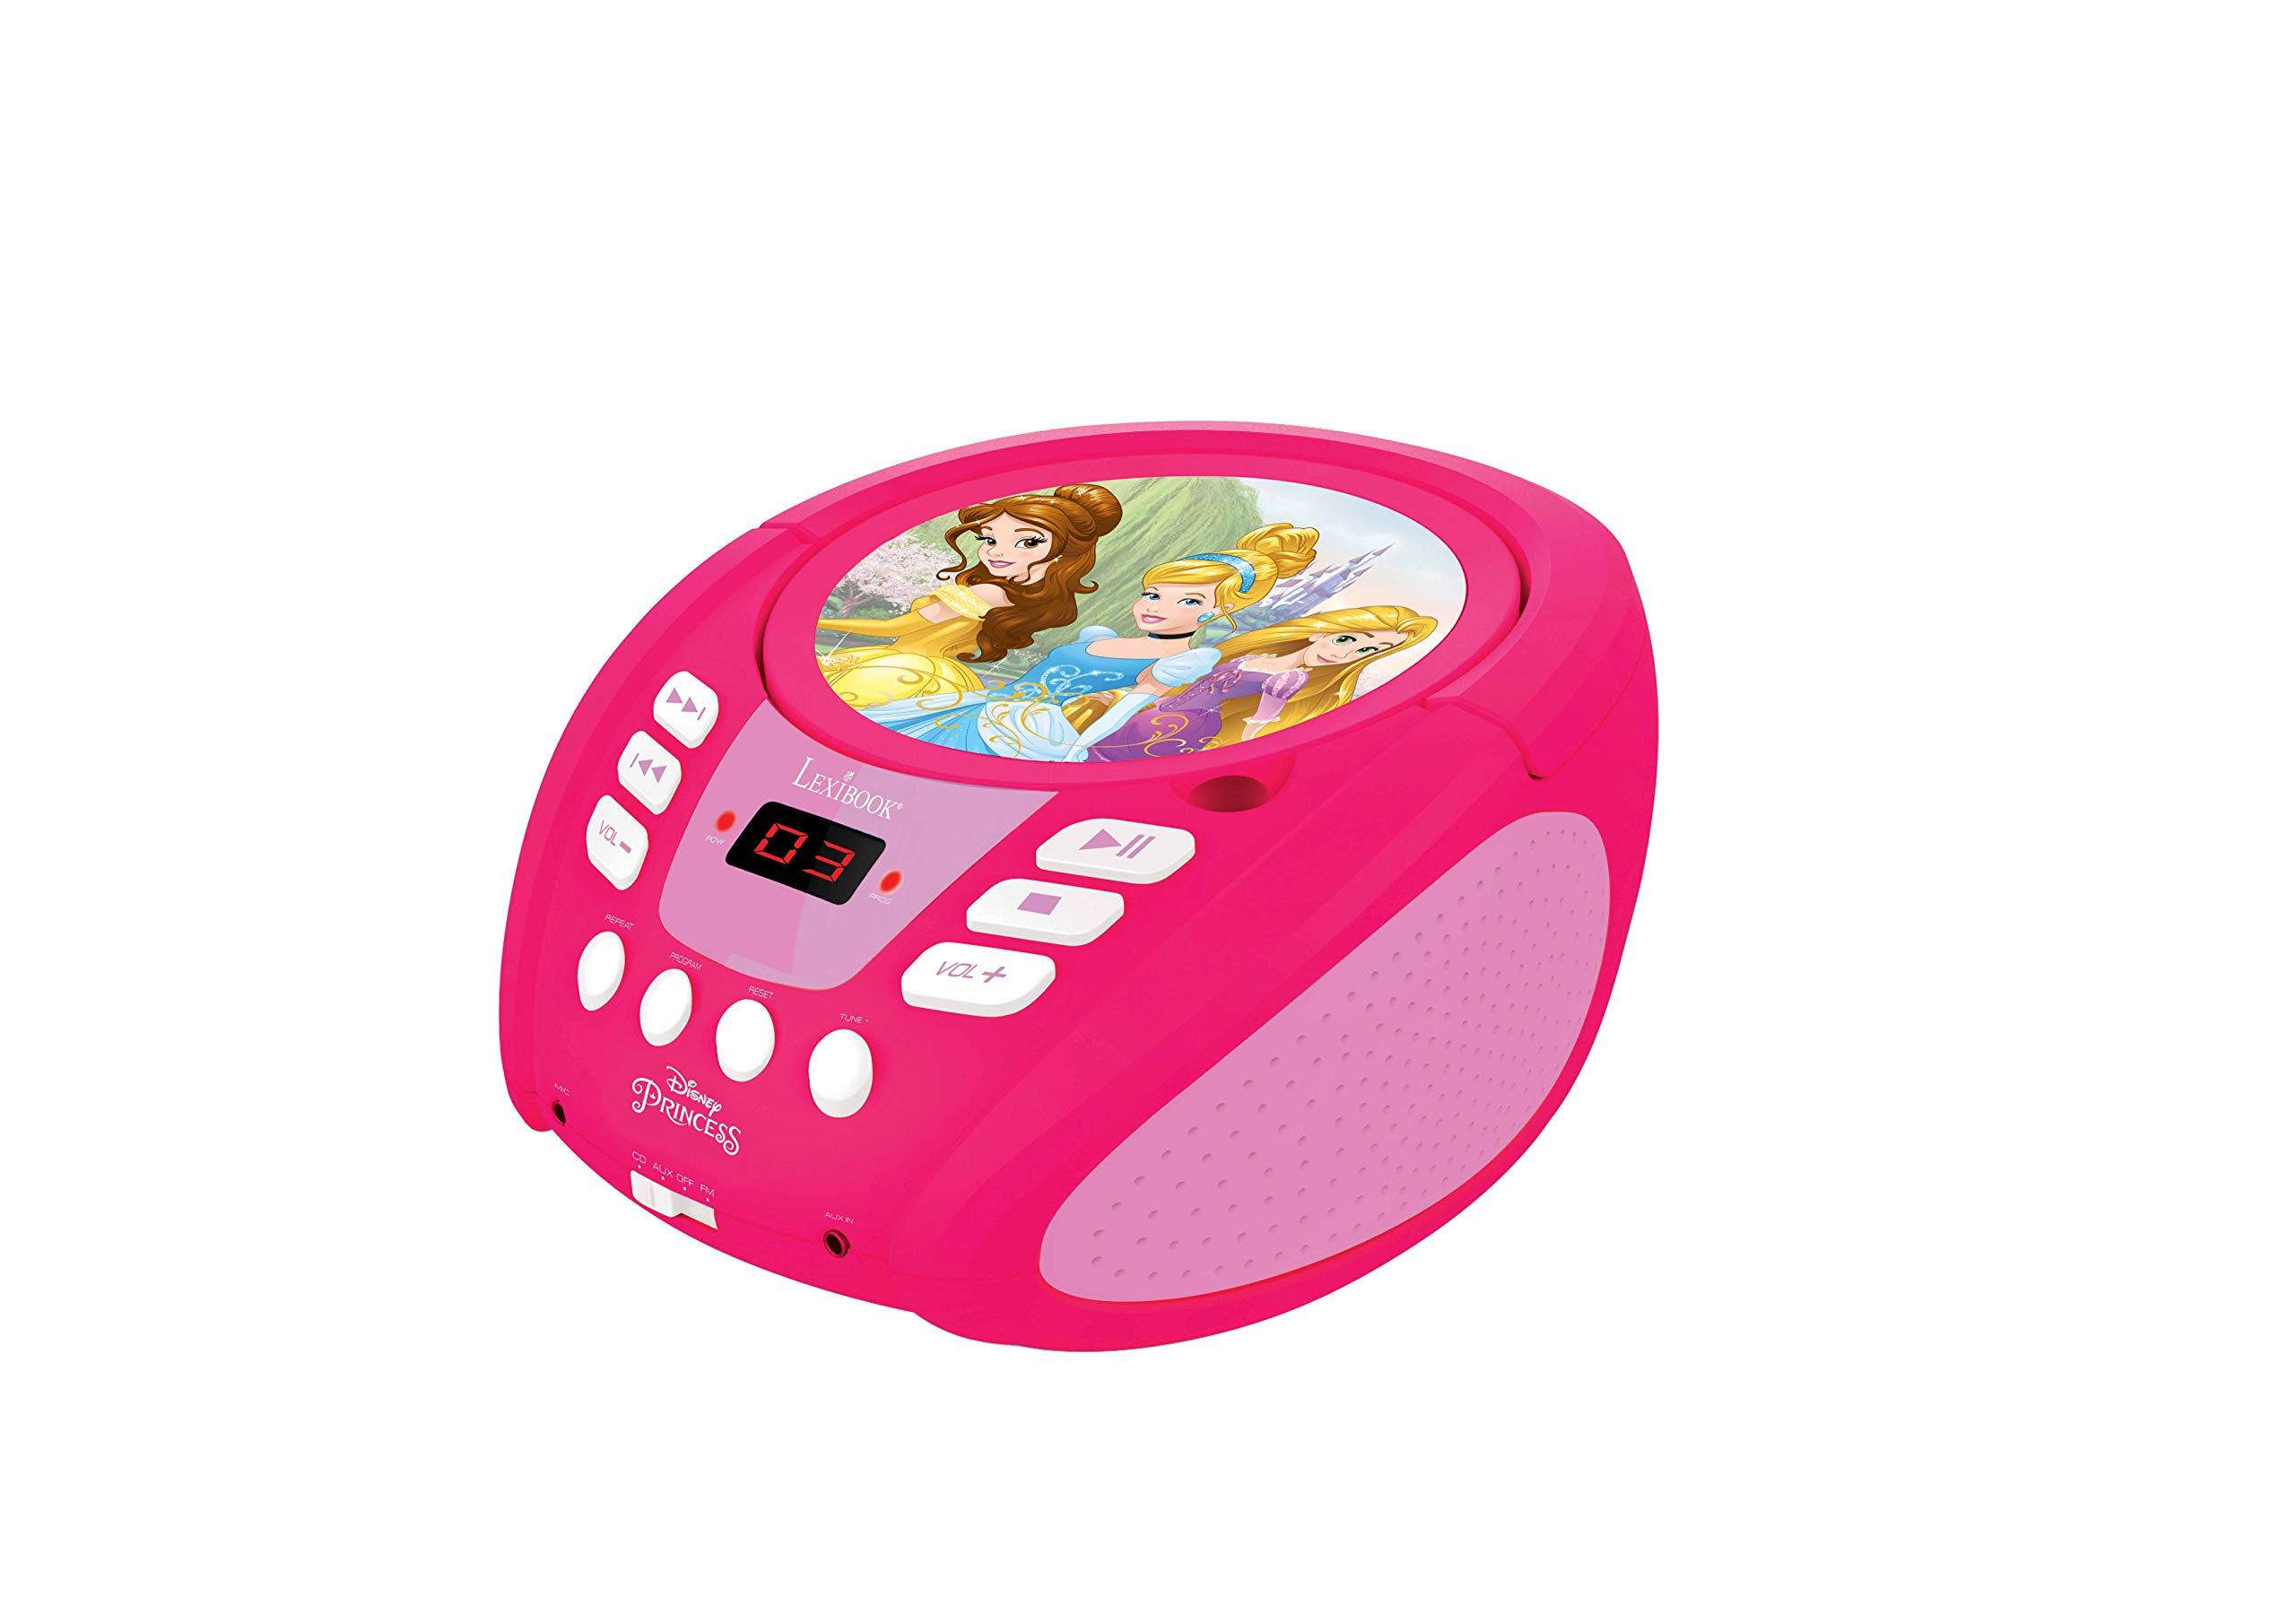 LEXiBOOK Disney Princess Boombox Radio CD Player by LEXiBOOK (Image #3)